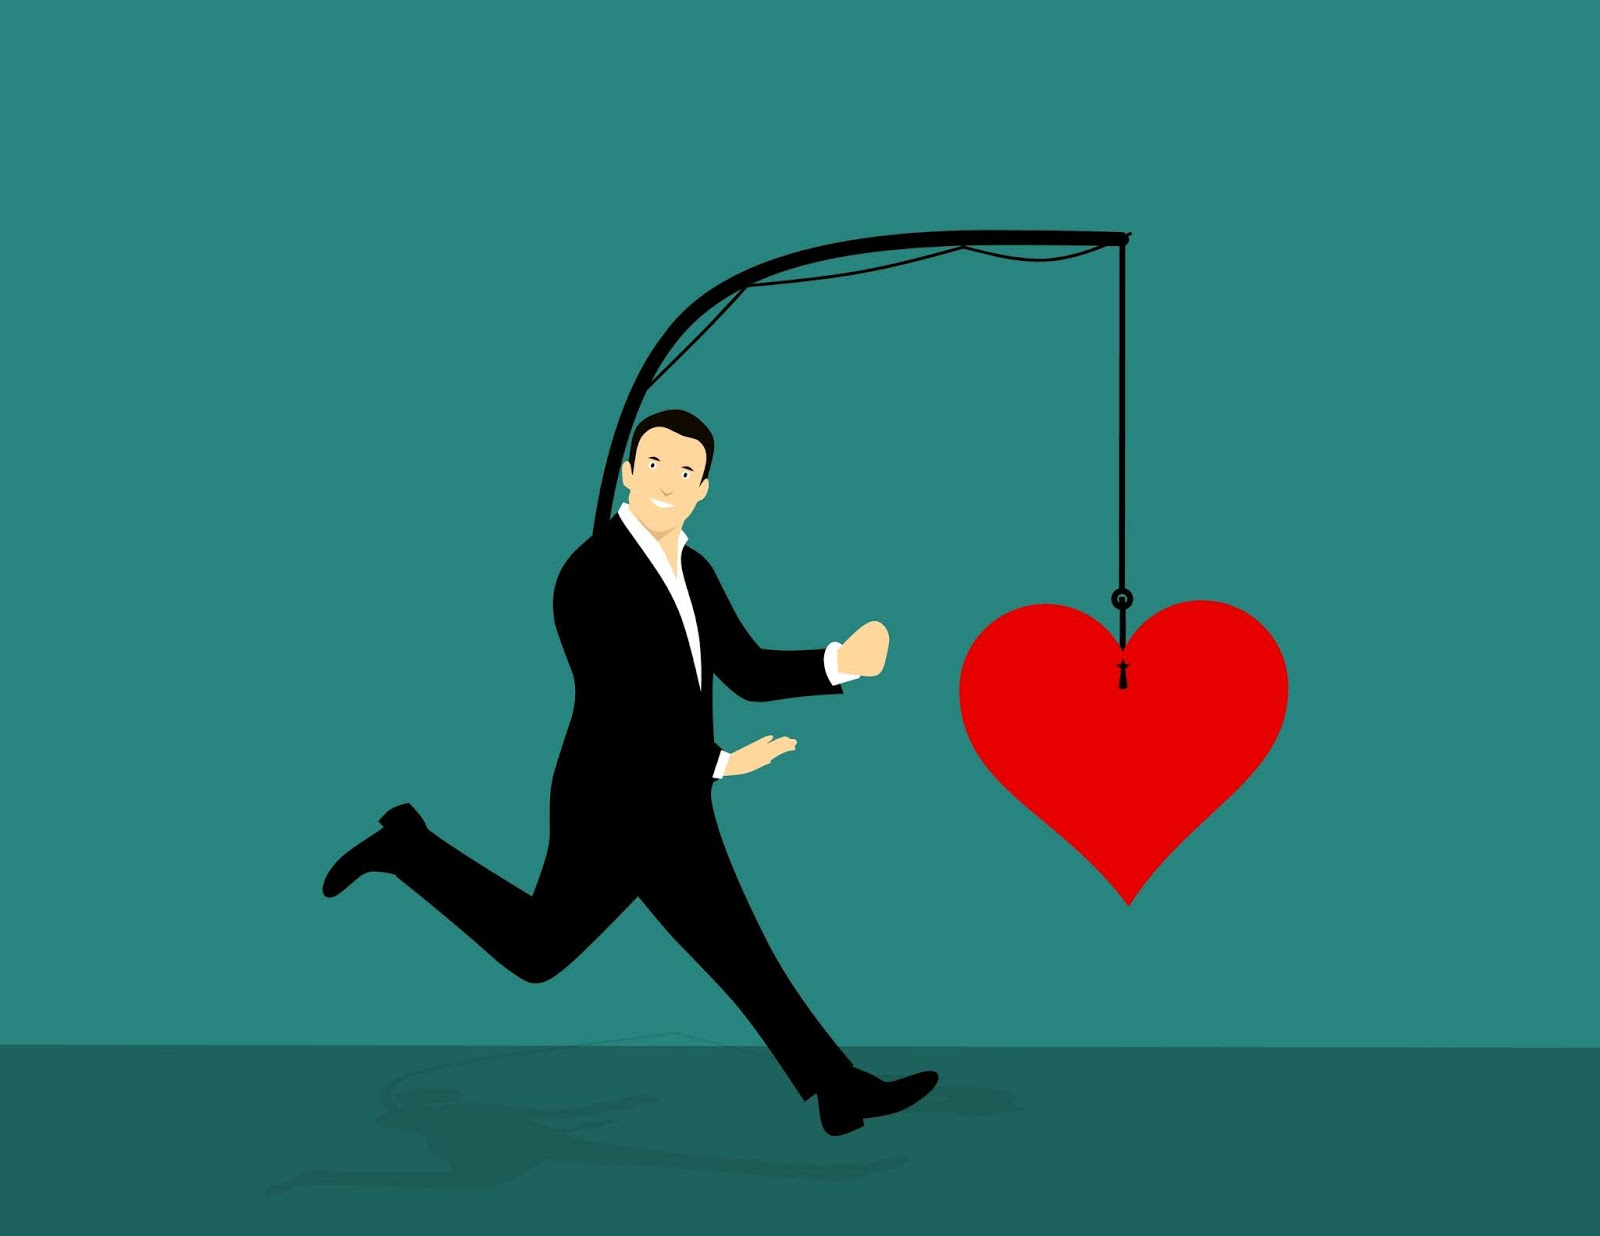 Illustration of man following his heart